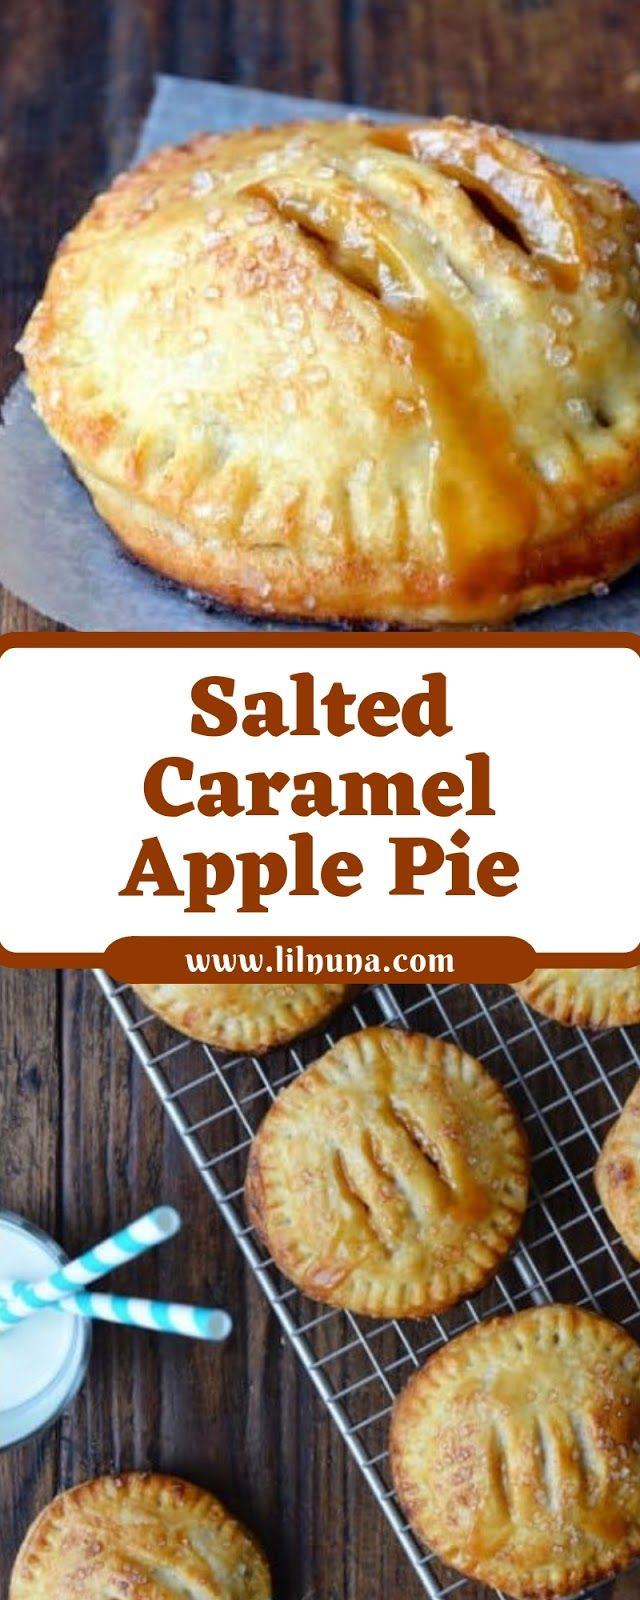 Salted Caramel Apple Pie #applepie